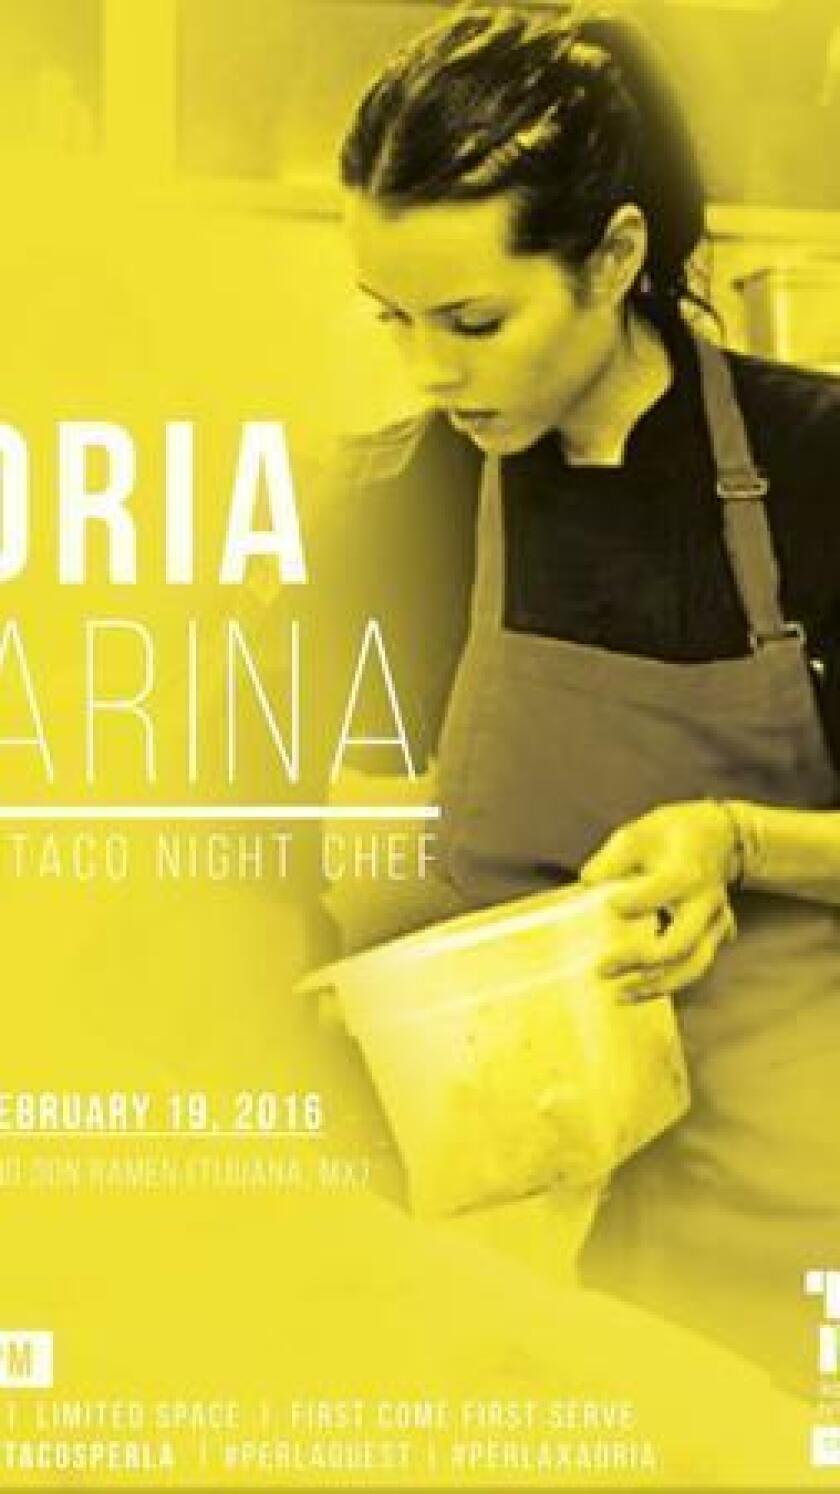 pac-sddsd-adria-marina-guest-chef-at-ta-20160819